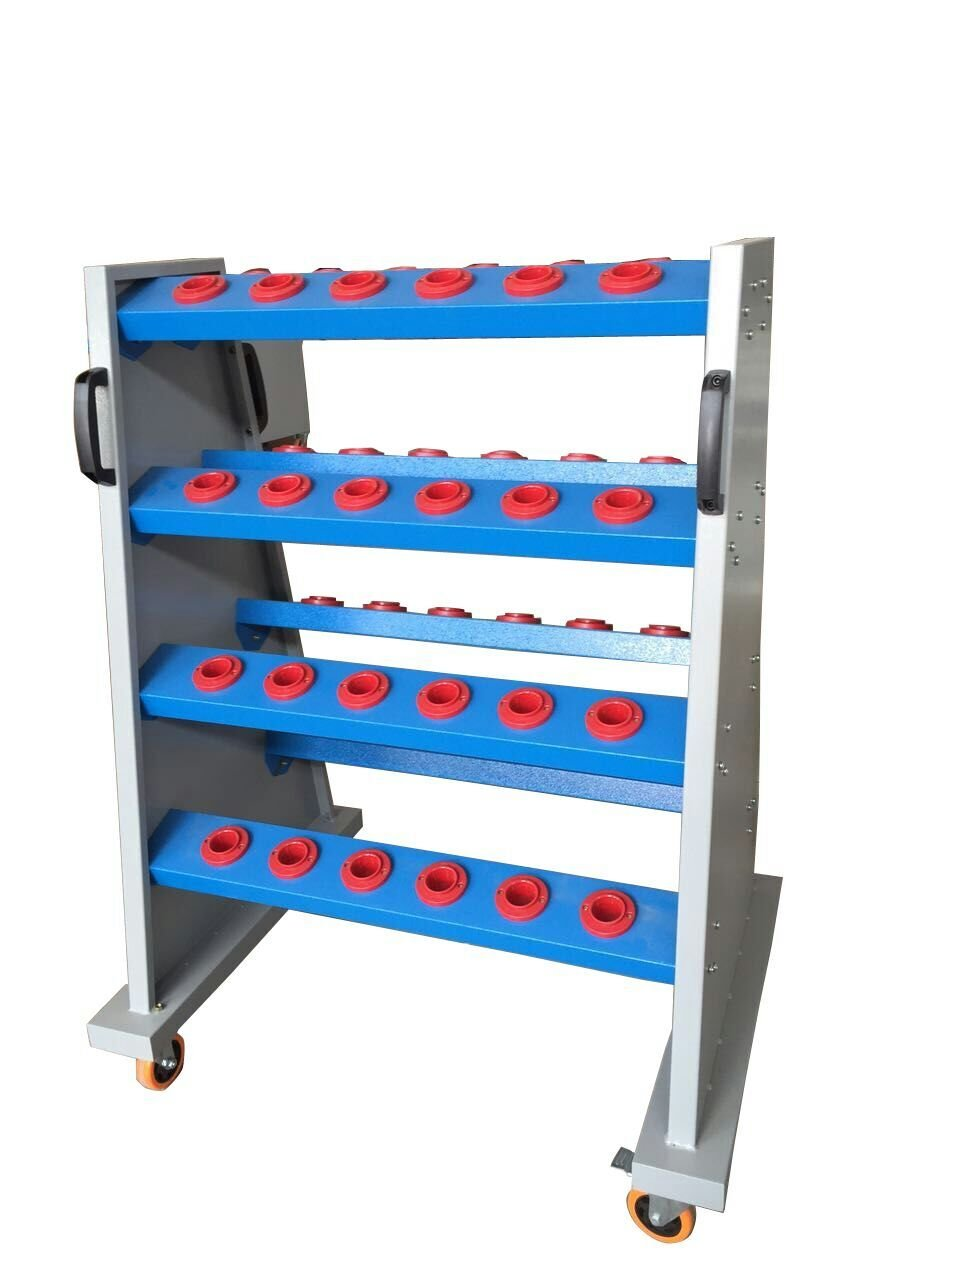 CAT40,BT40,NMTB40 heavy duty CNC Tool Tool cart shelf capacity 48 #CNC-48-new